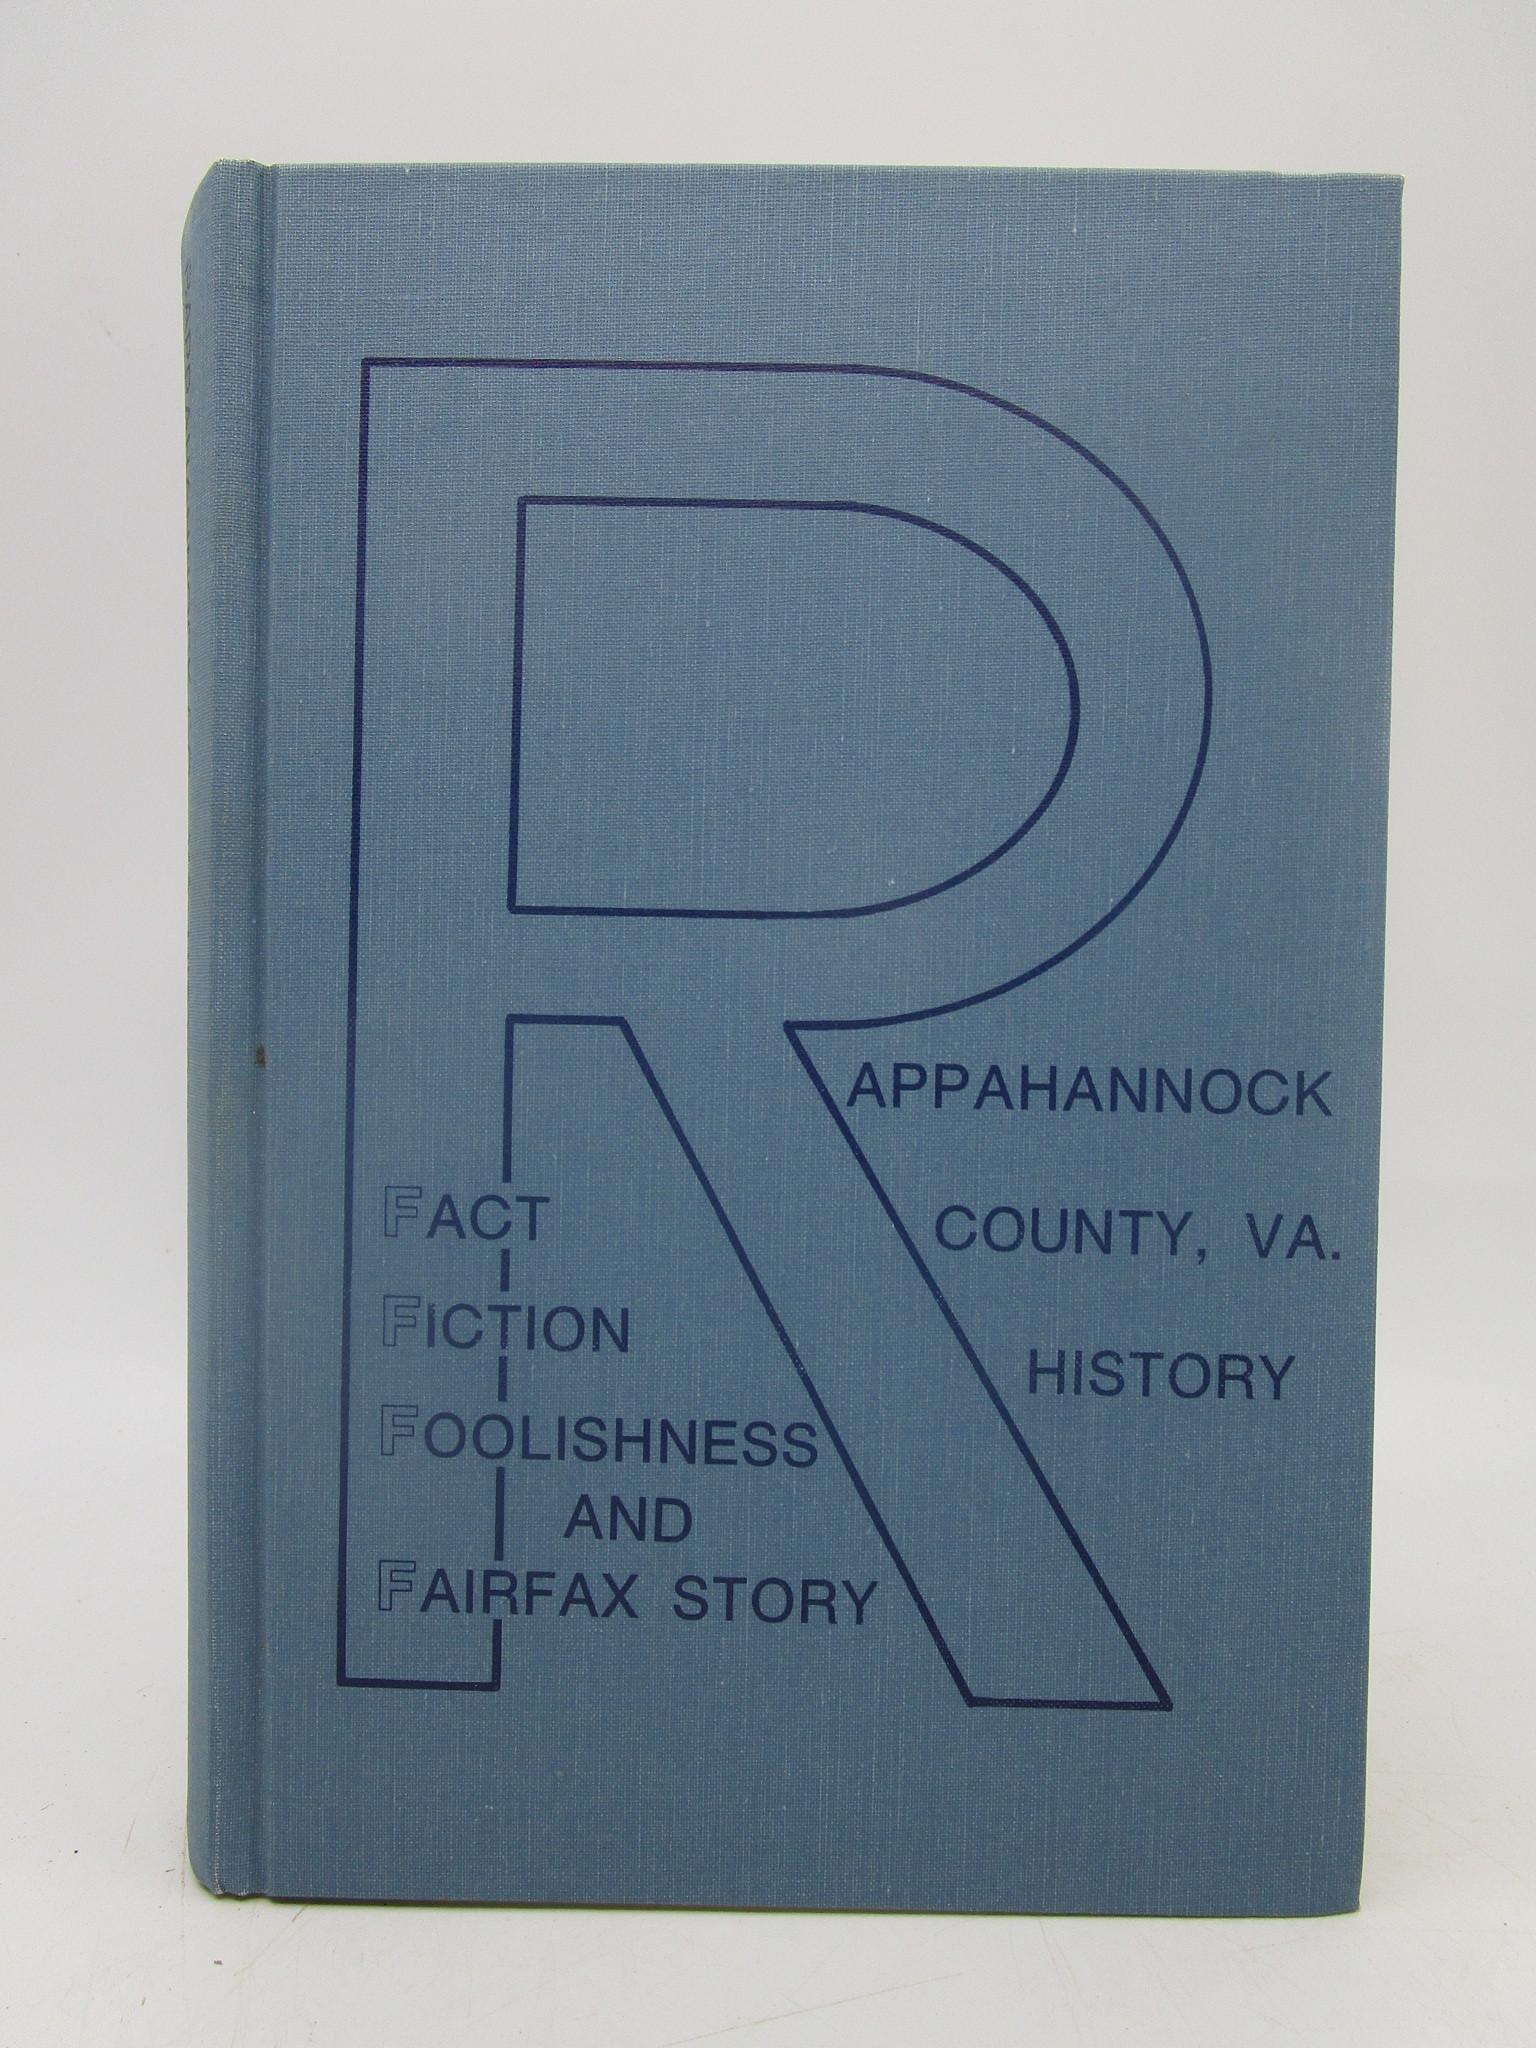 Image for Rappahannock County, Virginia - A History: Fact, Fiction, Foolishness and the Fairfax Story